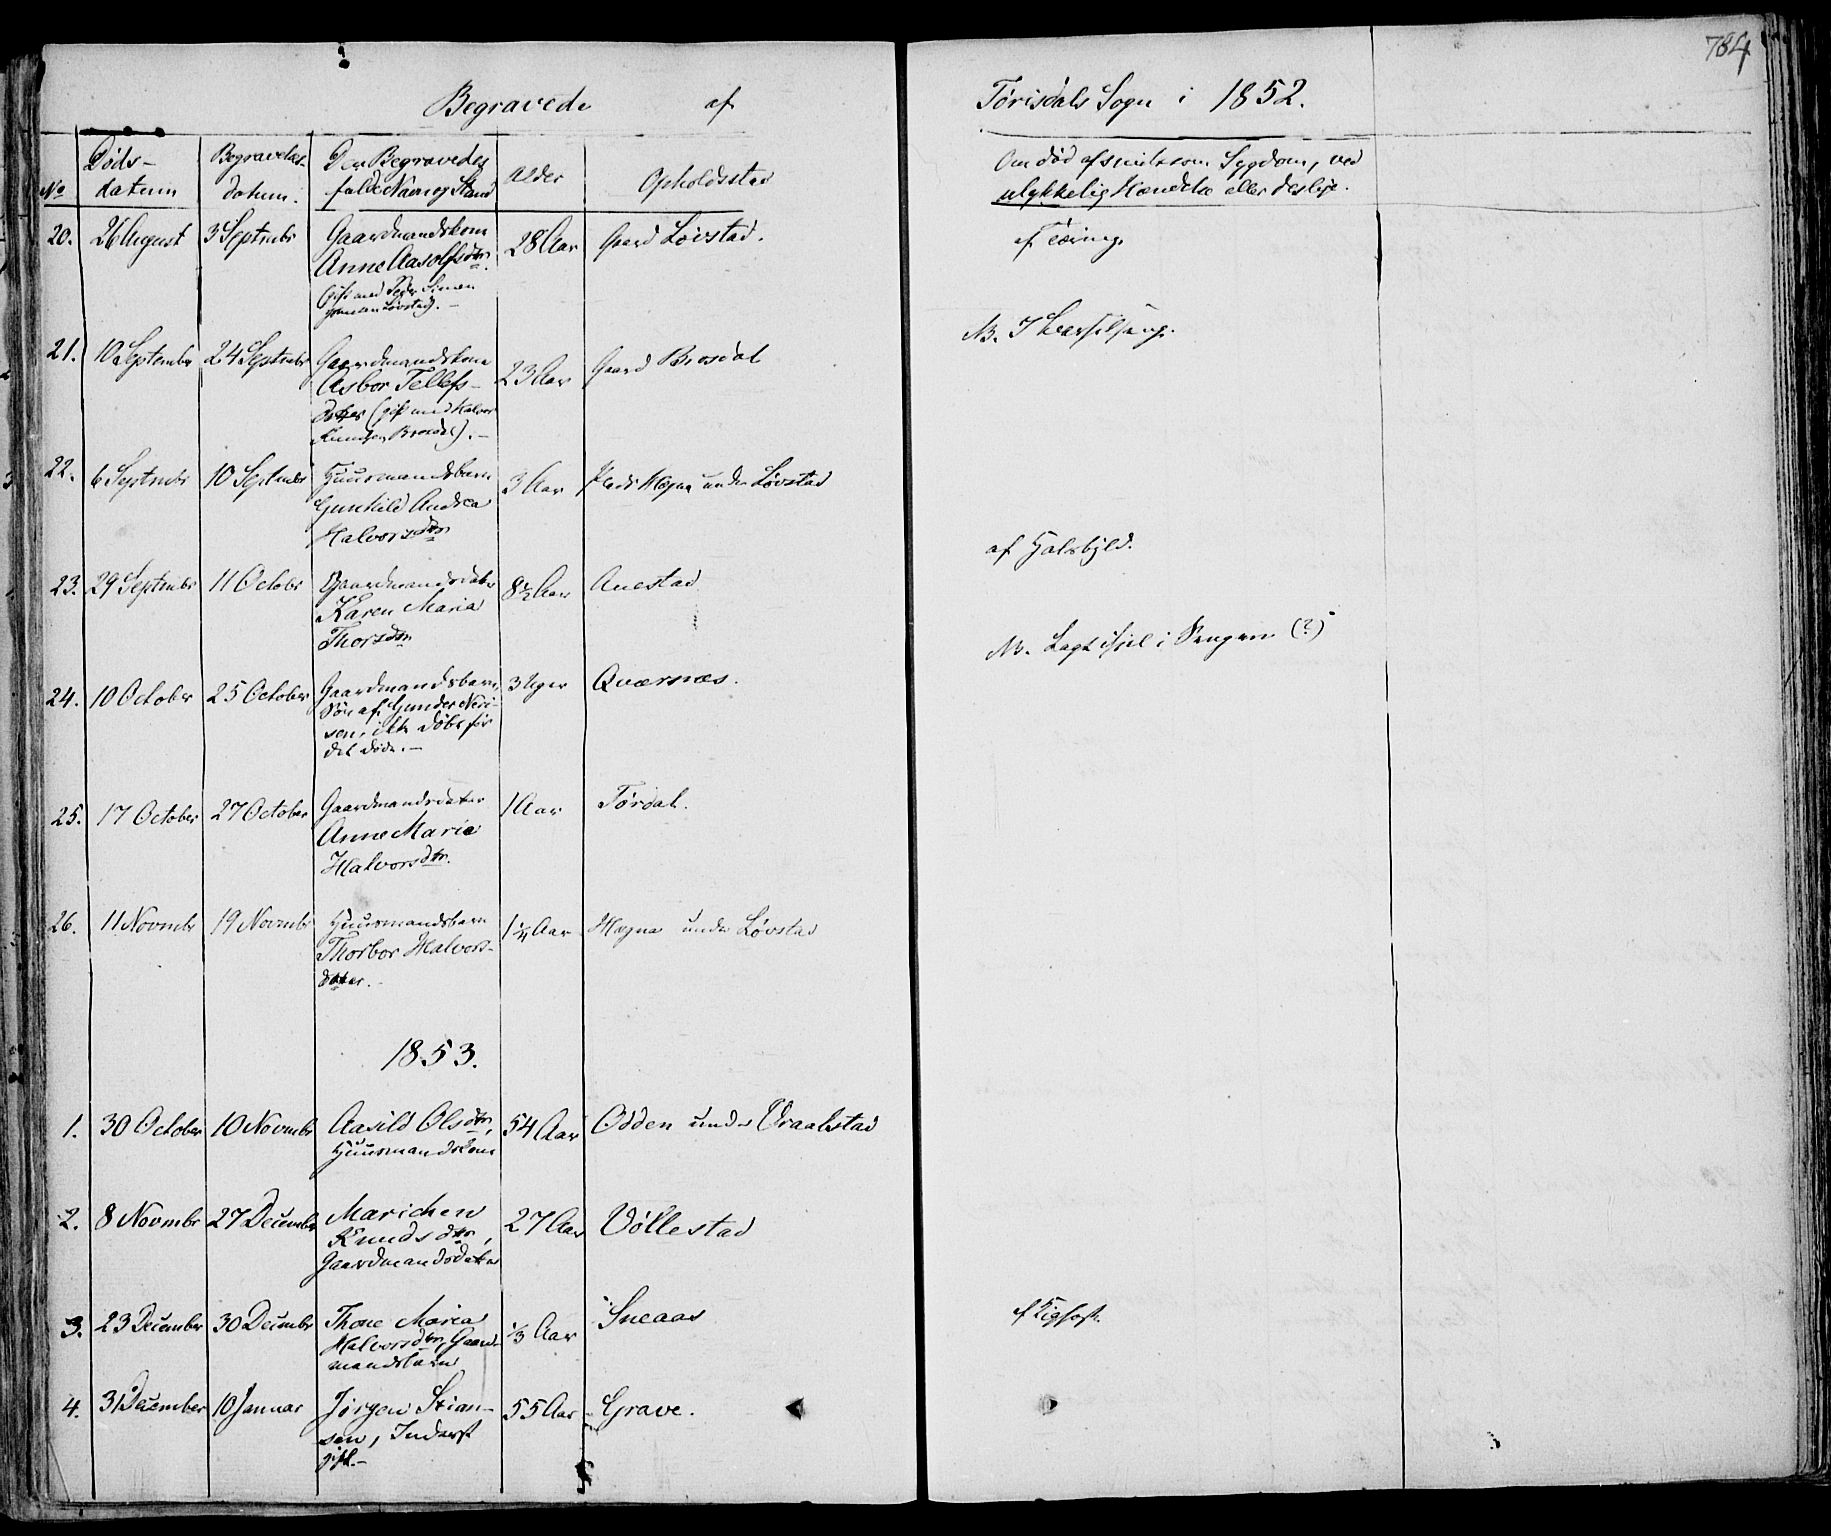 SAKO, Drangedal kirkebøker, F/Fa/L0007b: Ministerialbok nr. 7b, 1837-1856, s. 784